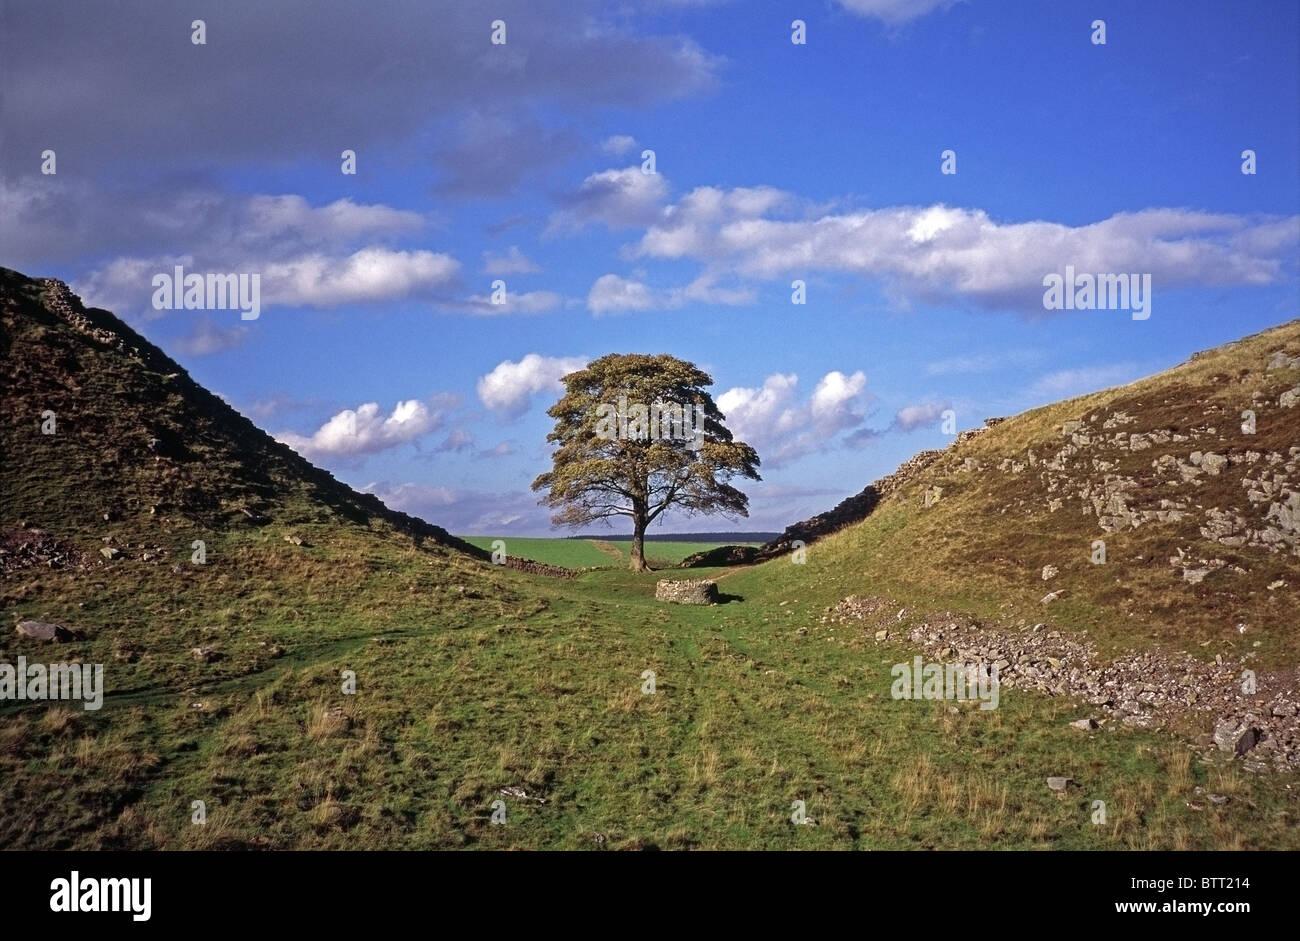 Sycamore Tree (Acer pseudoplatanus) at Sycamore Gap, Hadrian's Wall, Northumberland, England - Stock Image